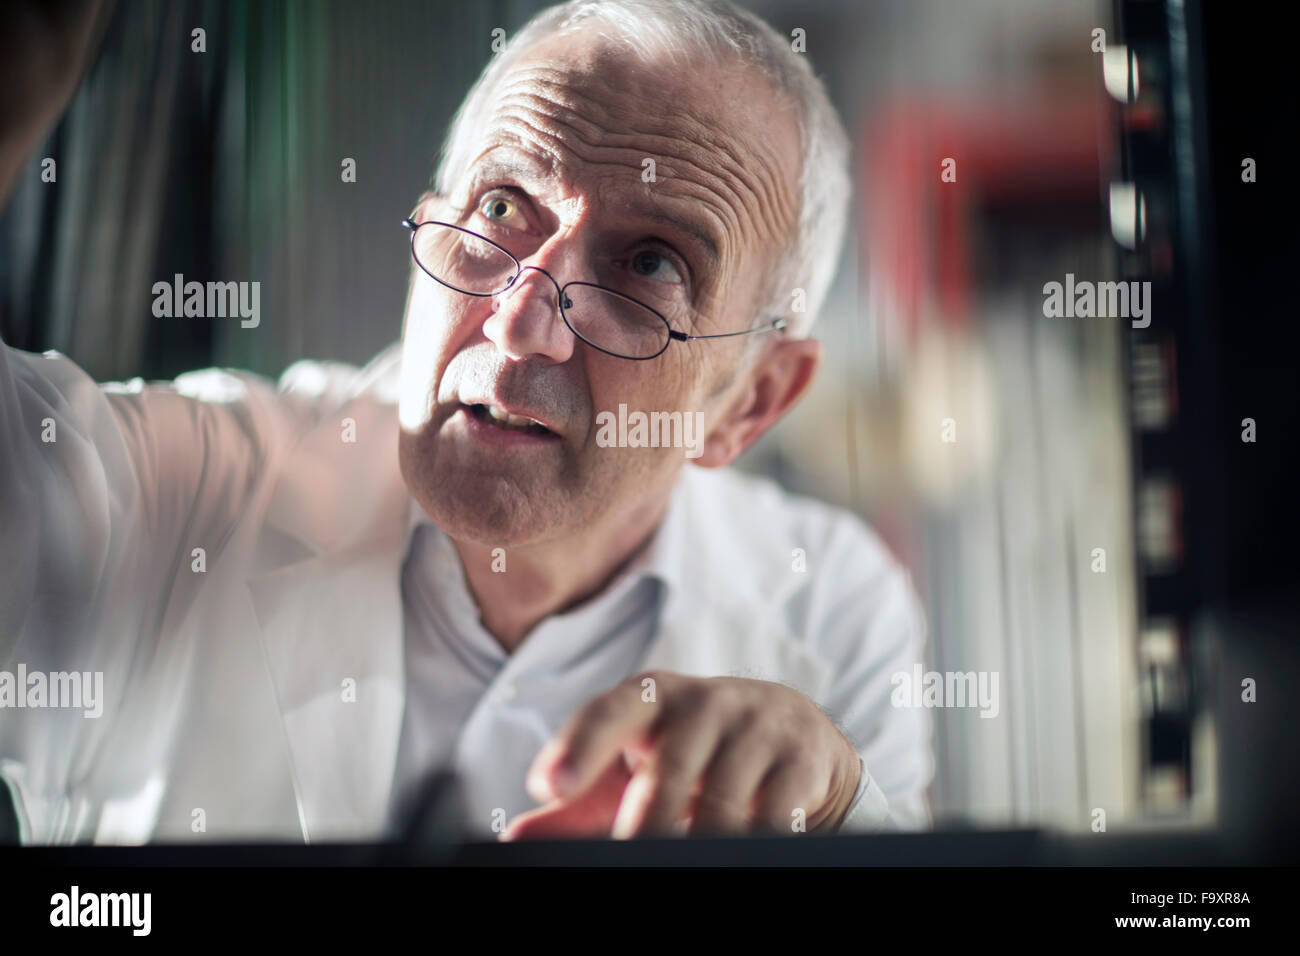 Porträt des Mannes Kontrolle Gerät Stockbild